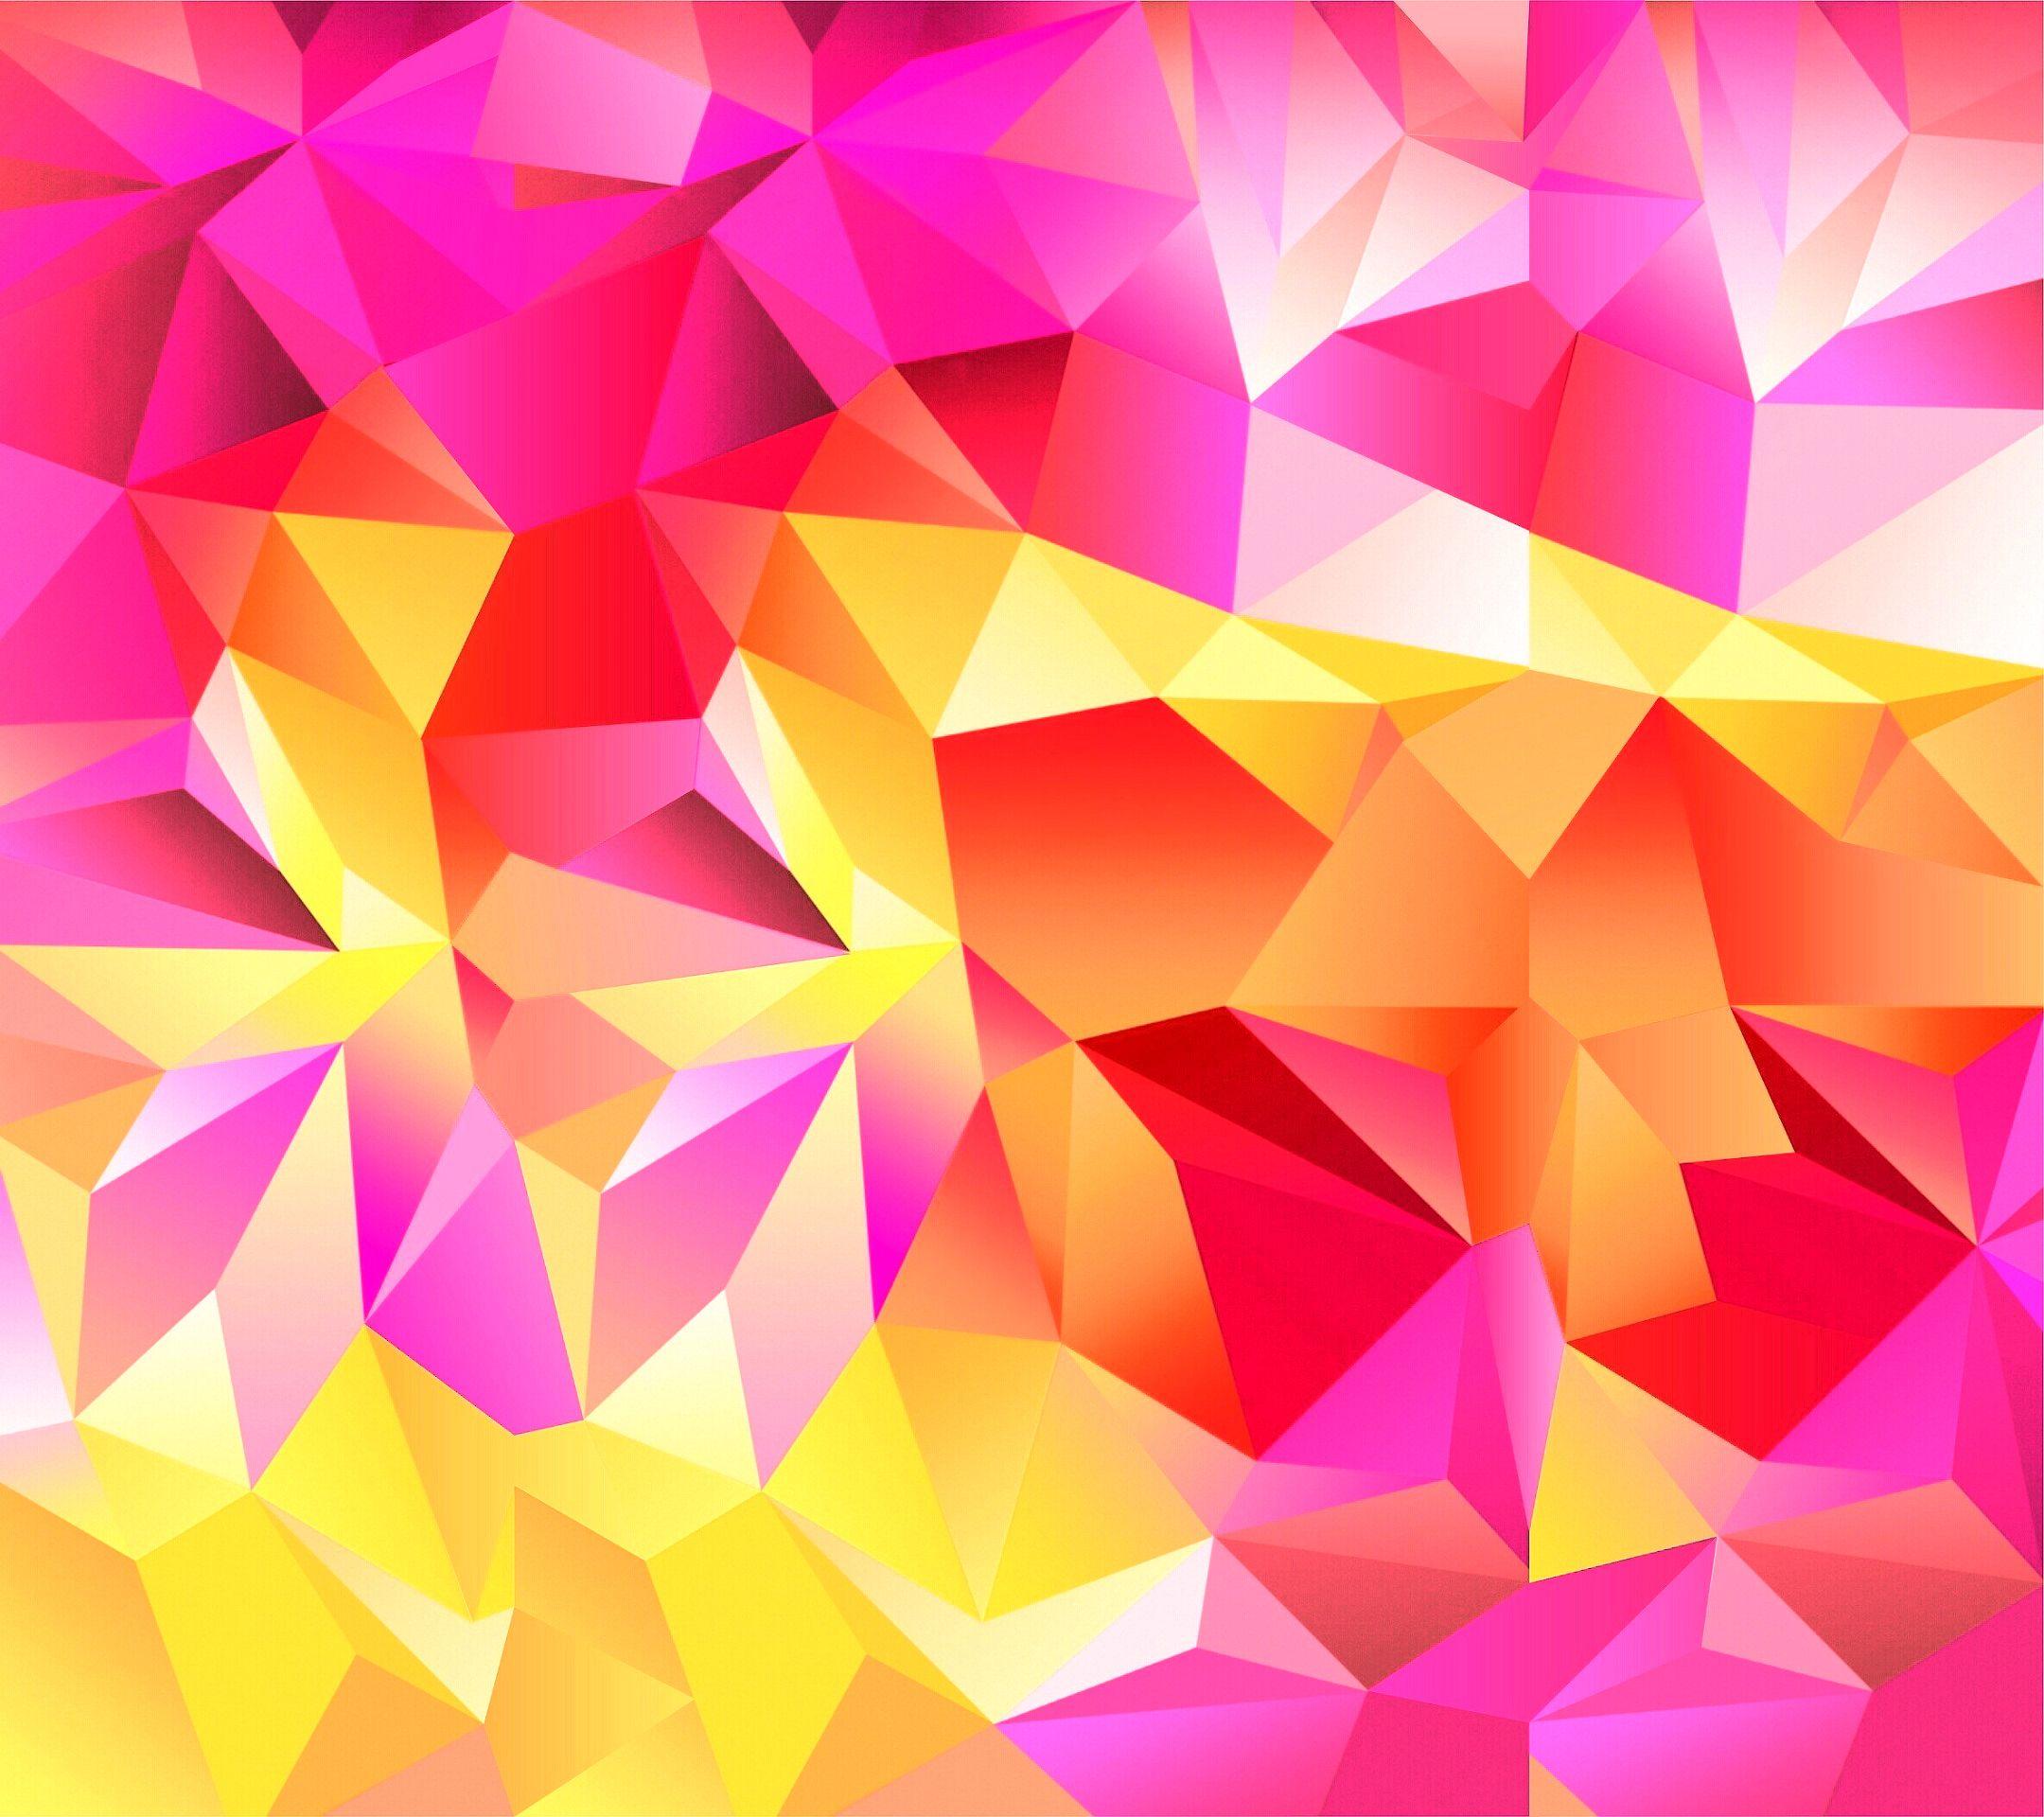 The 1 GalaxyS5 Default Coral Wallpaper I Just Shared 1galaxys5wallpaper